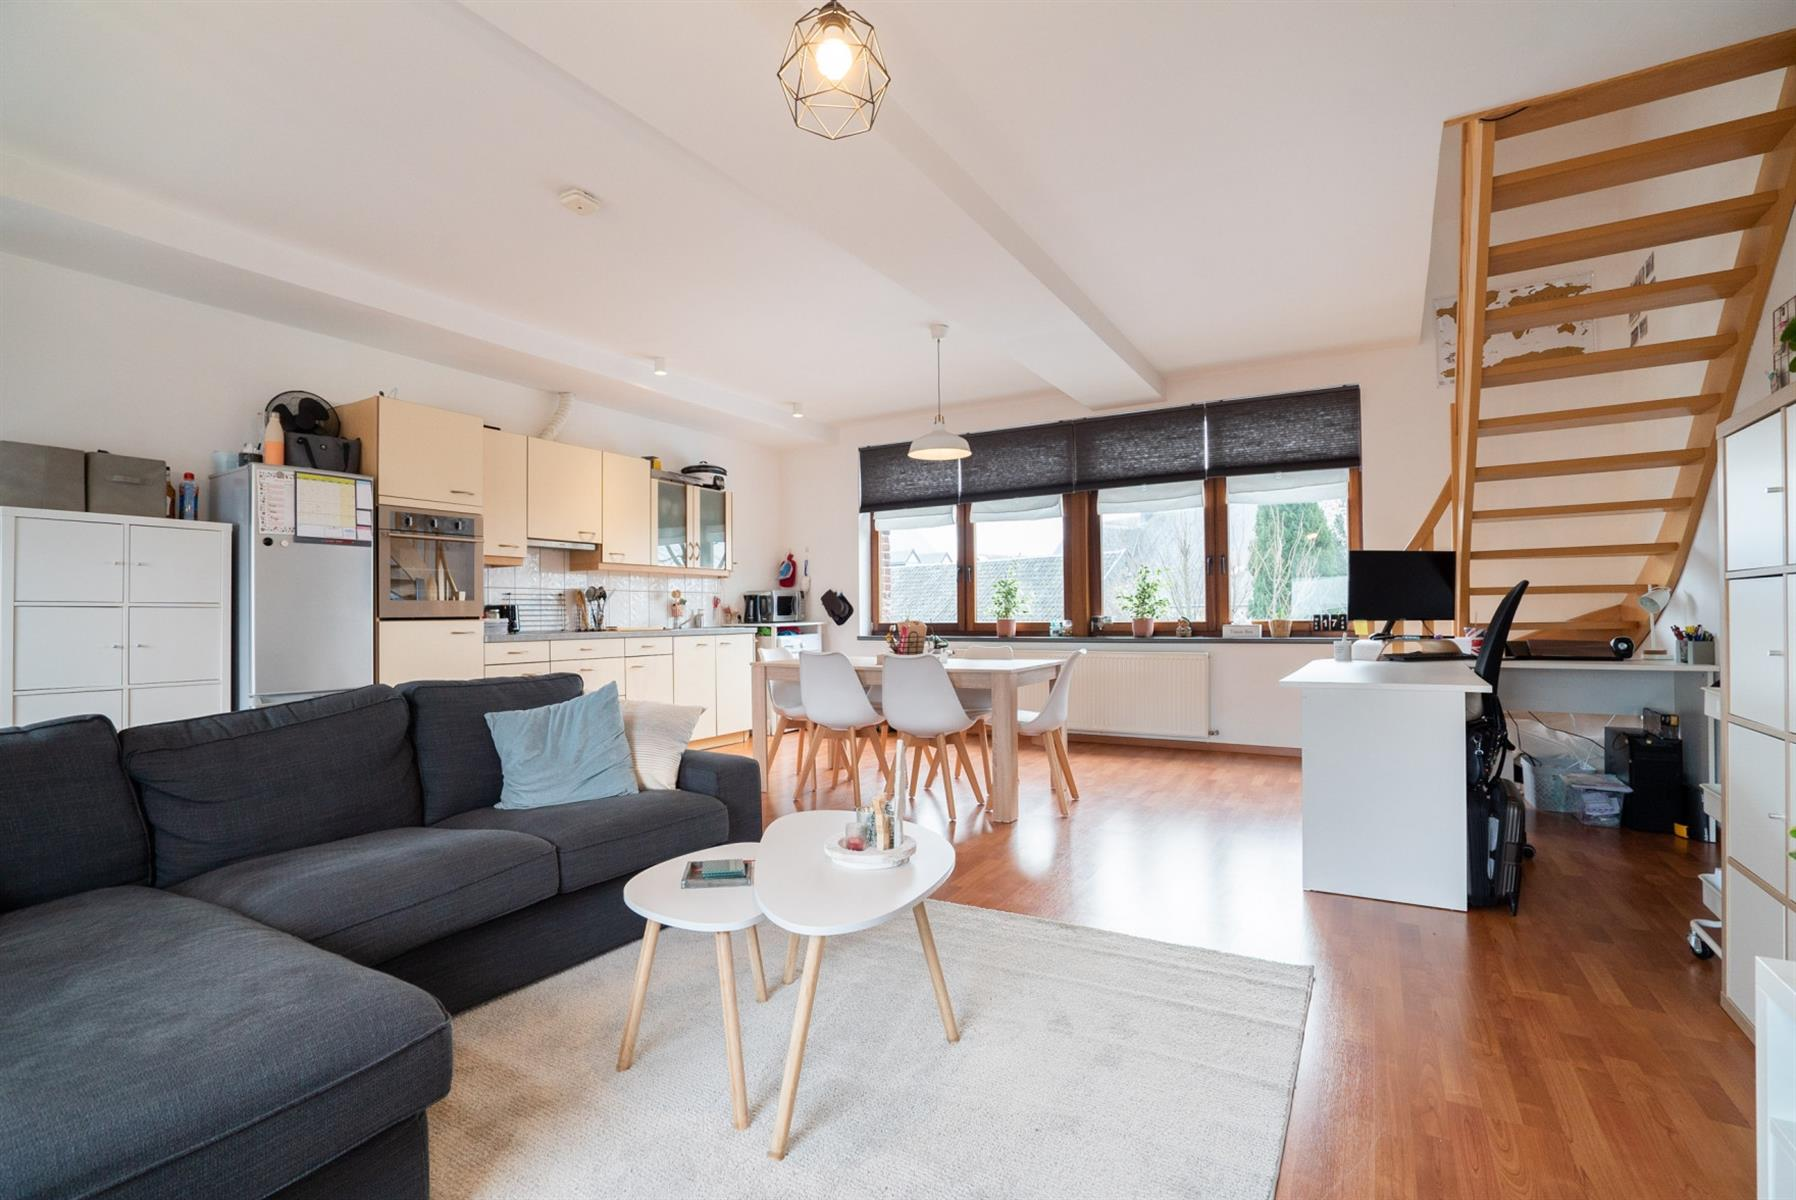 Appartement - Welkenraedt Henri-Chapelle - #4270870-1